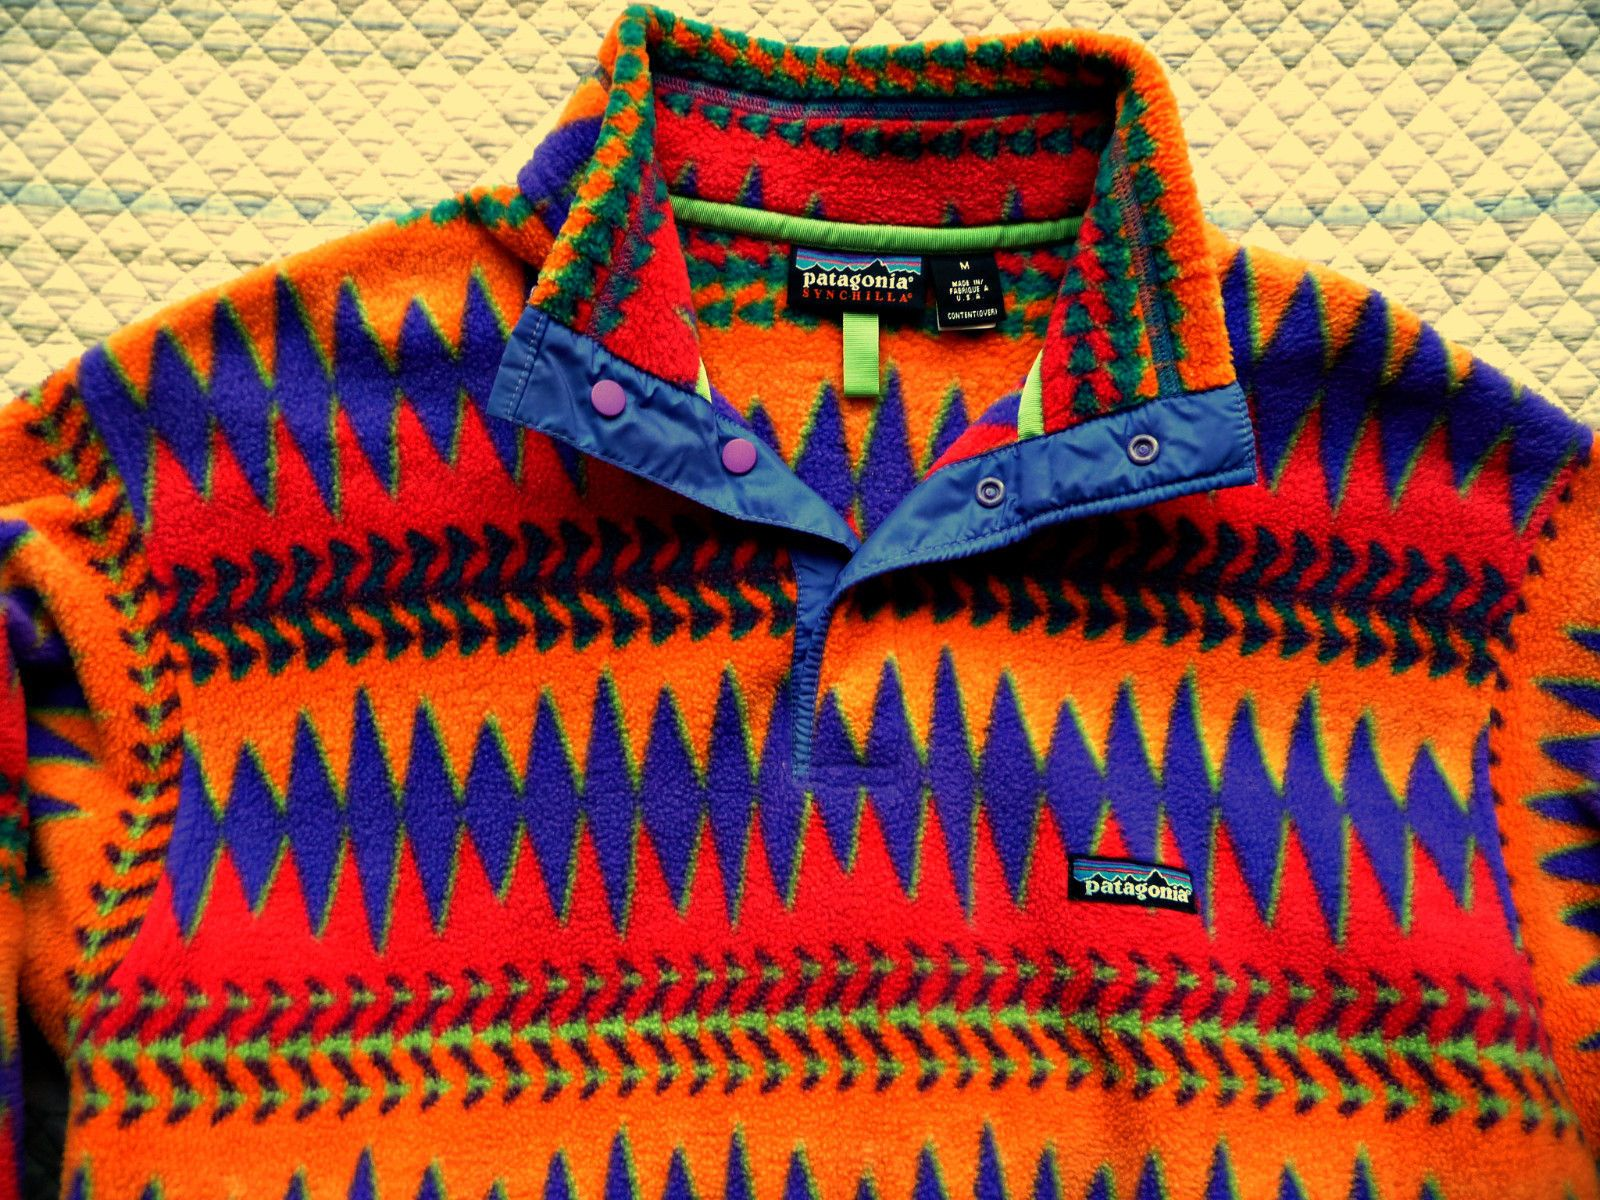 2b2d2b0a Vintage Patagonia Retro Colorful Synchilla Fleece Snap T Pullover Jacket M  | eBay